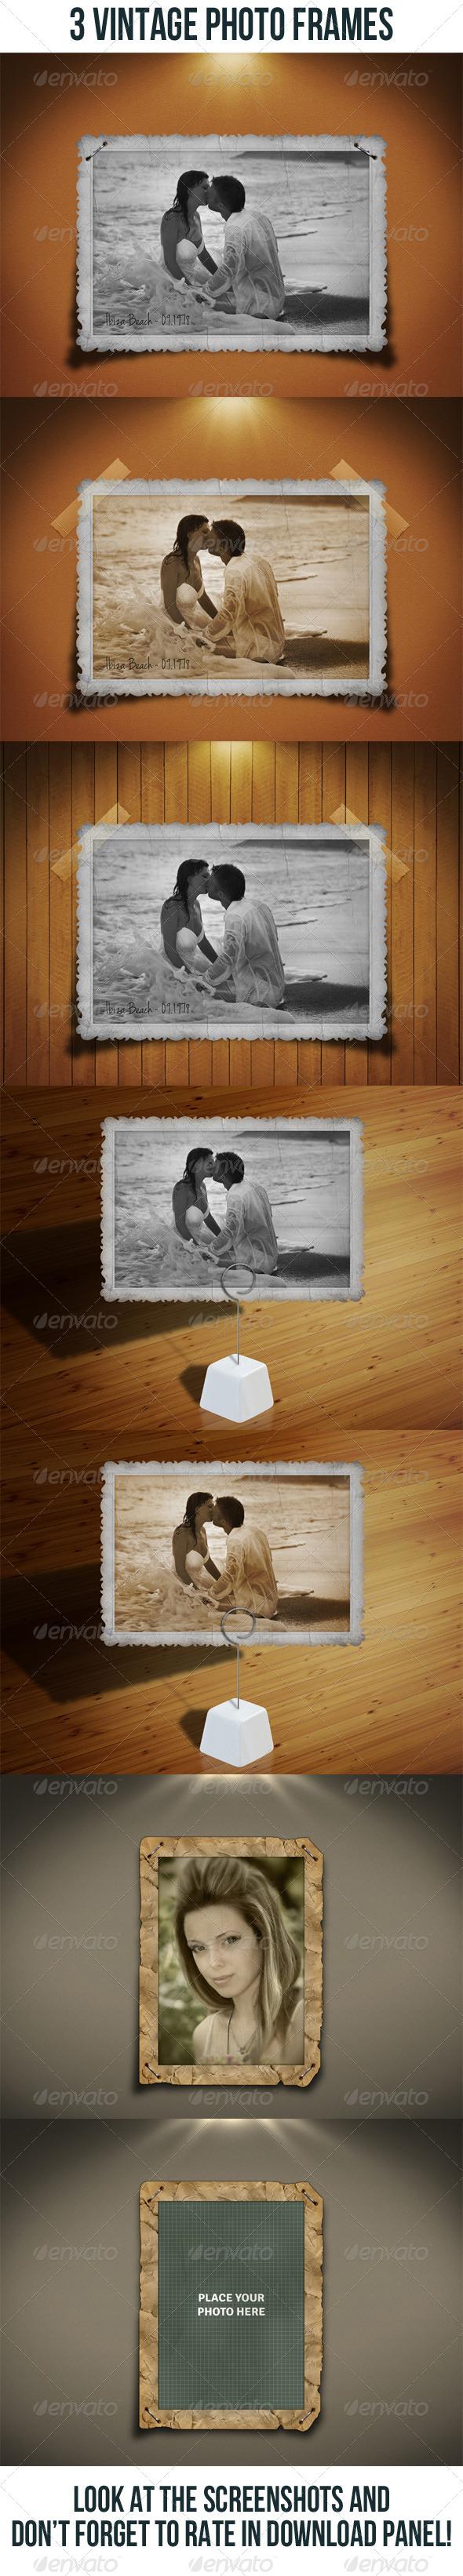 GraphicRiver 3 Vintage Photo Frames Bundle 6779309